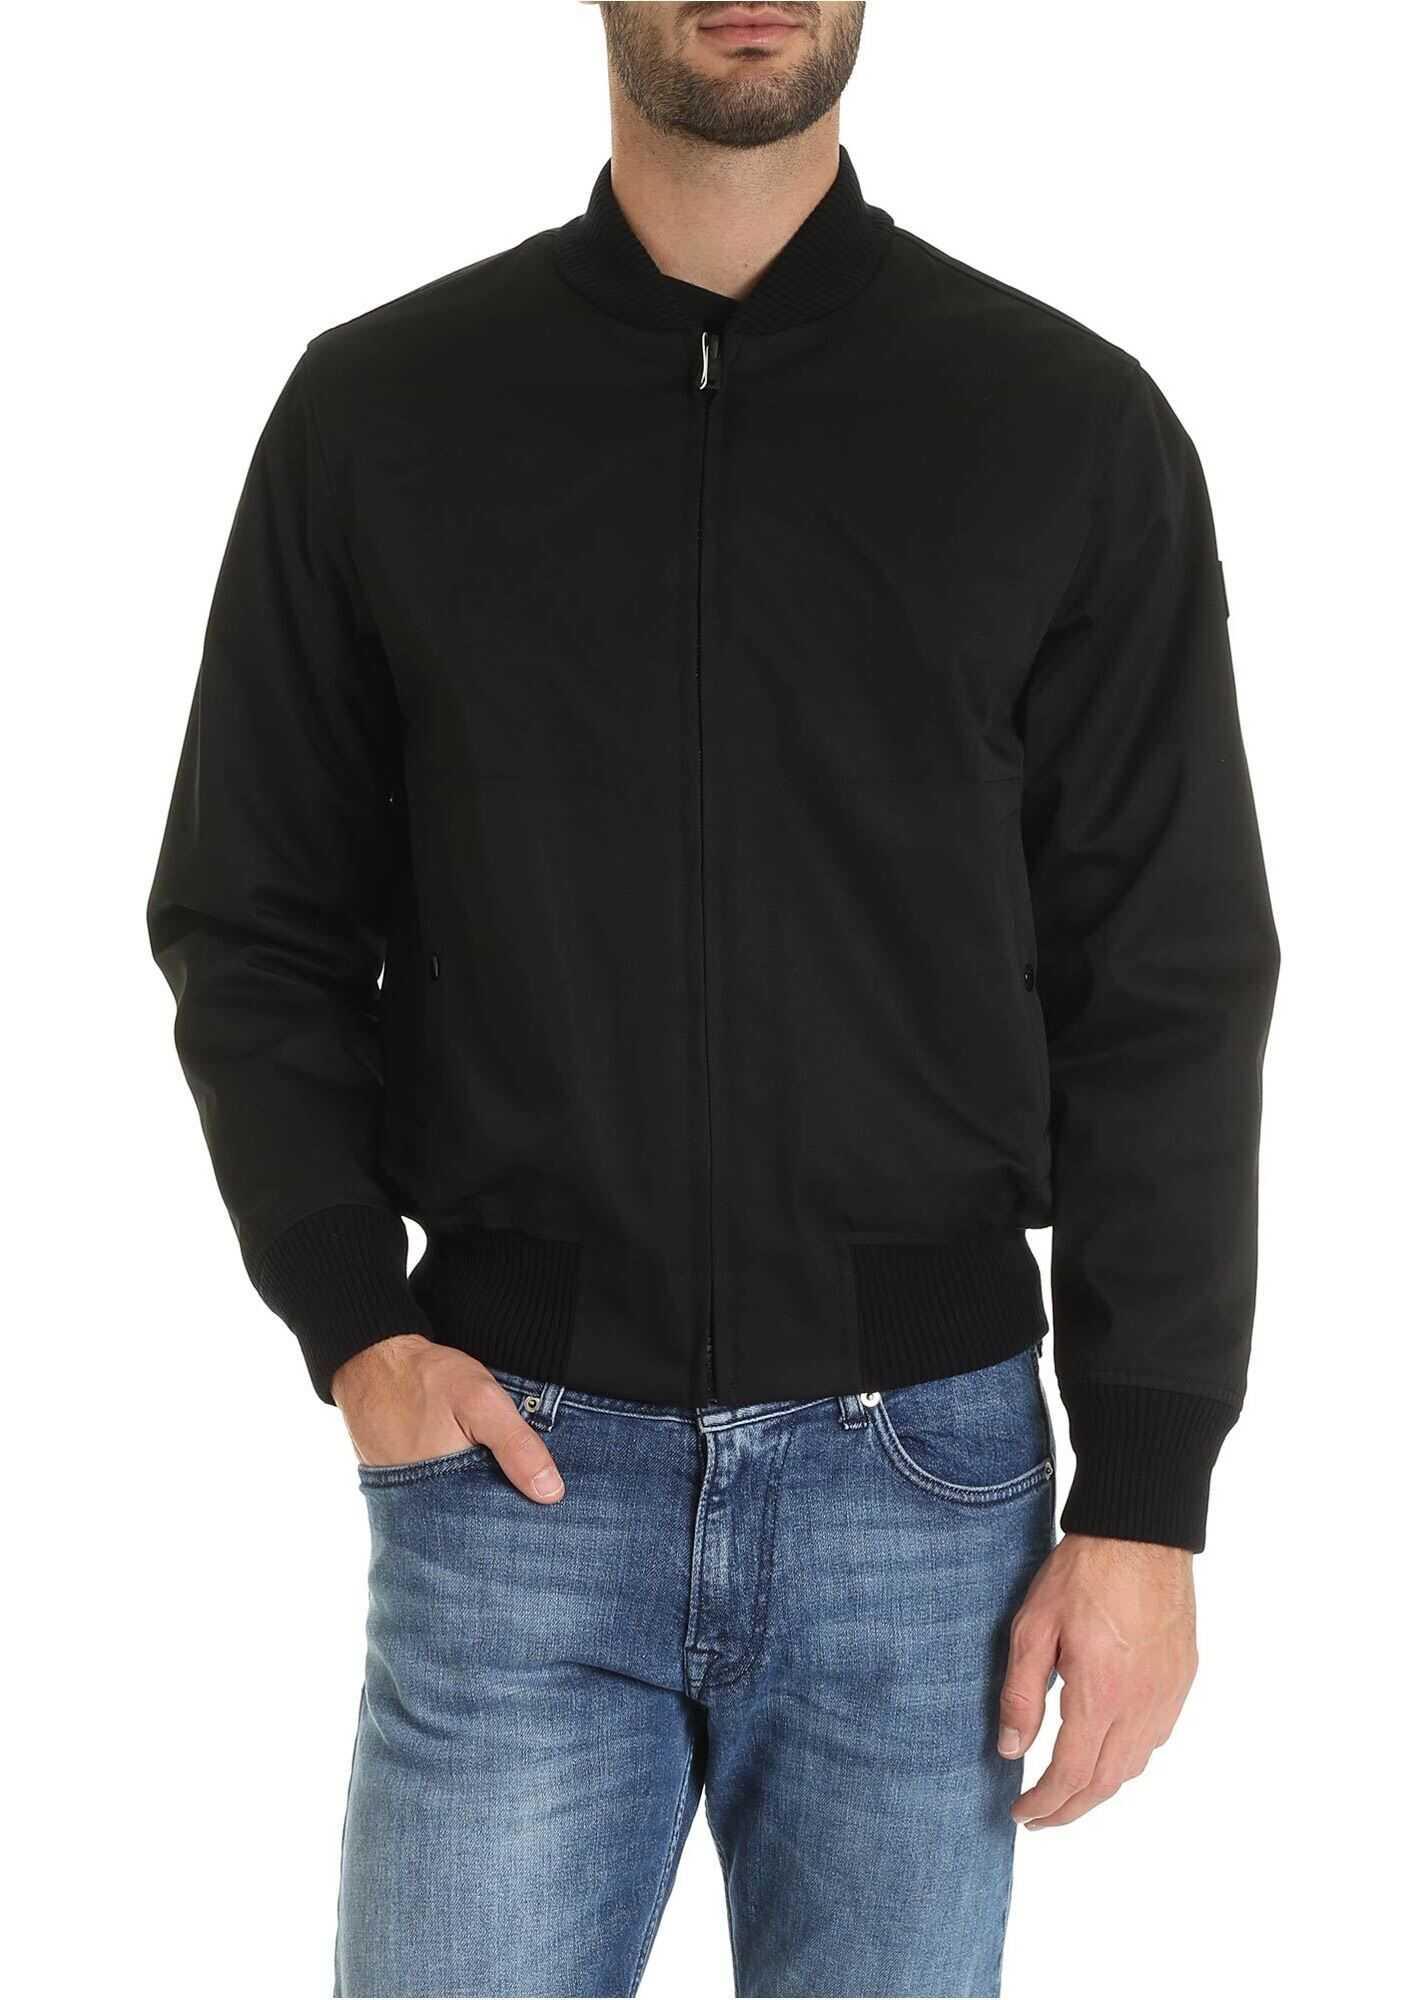 Wool Detail Reversible Jacket In Black thumbnail